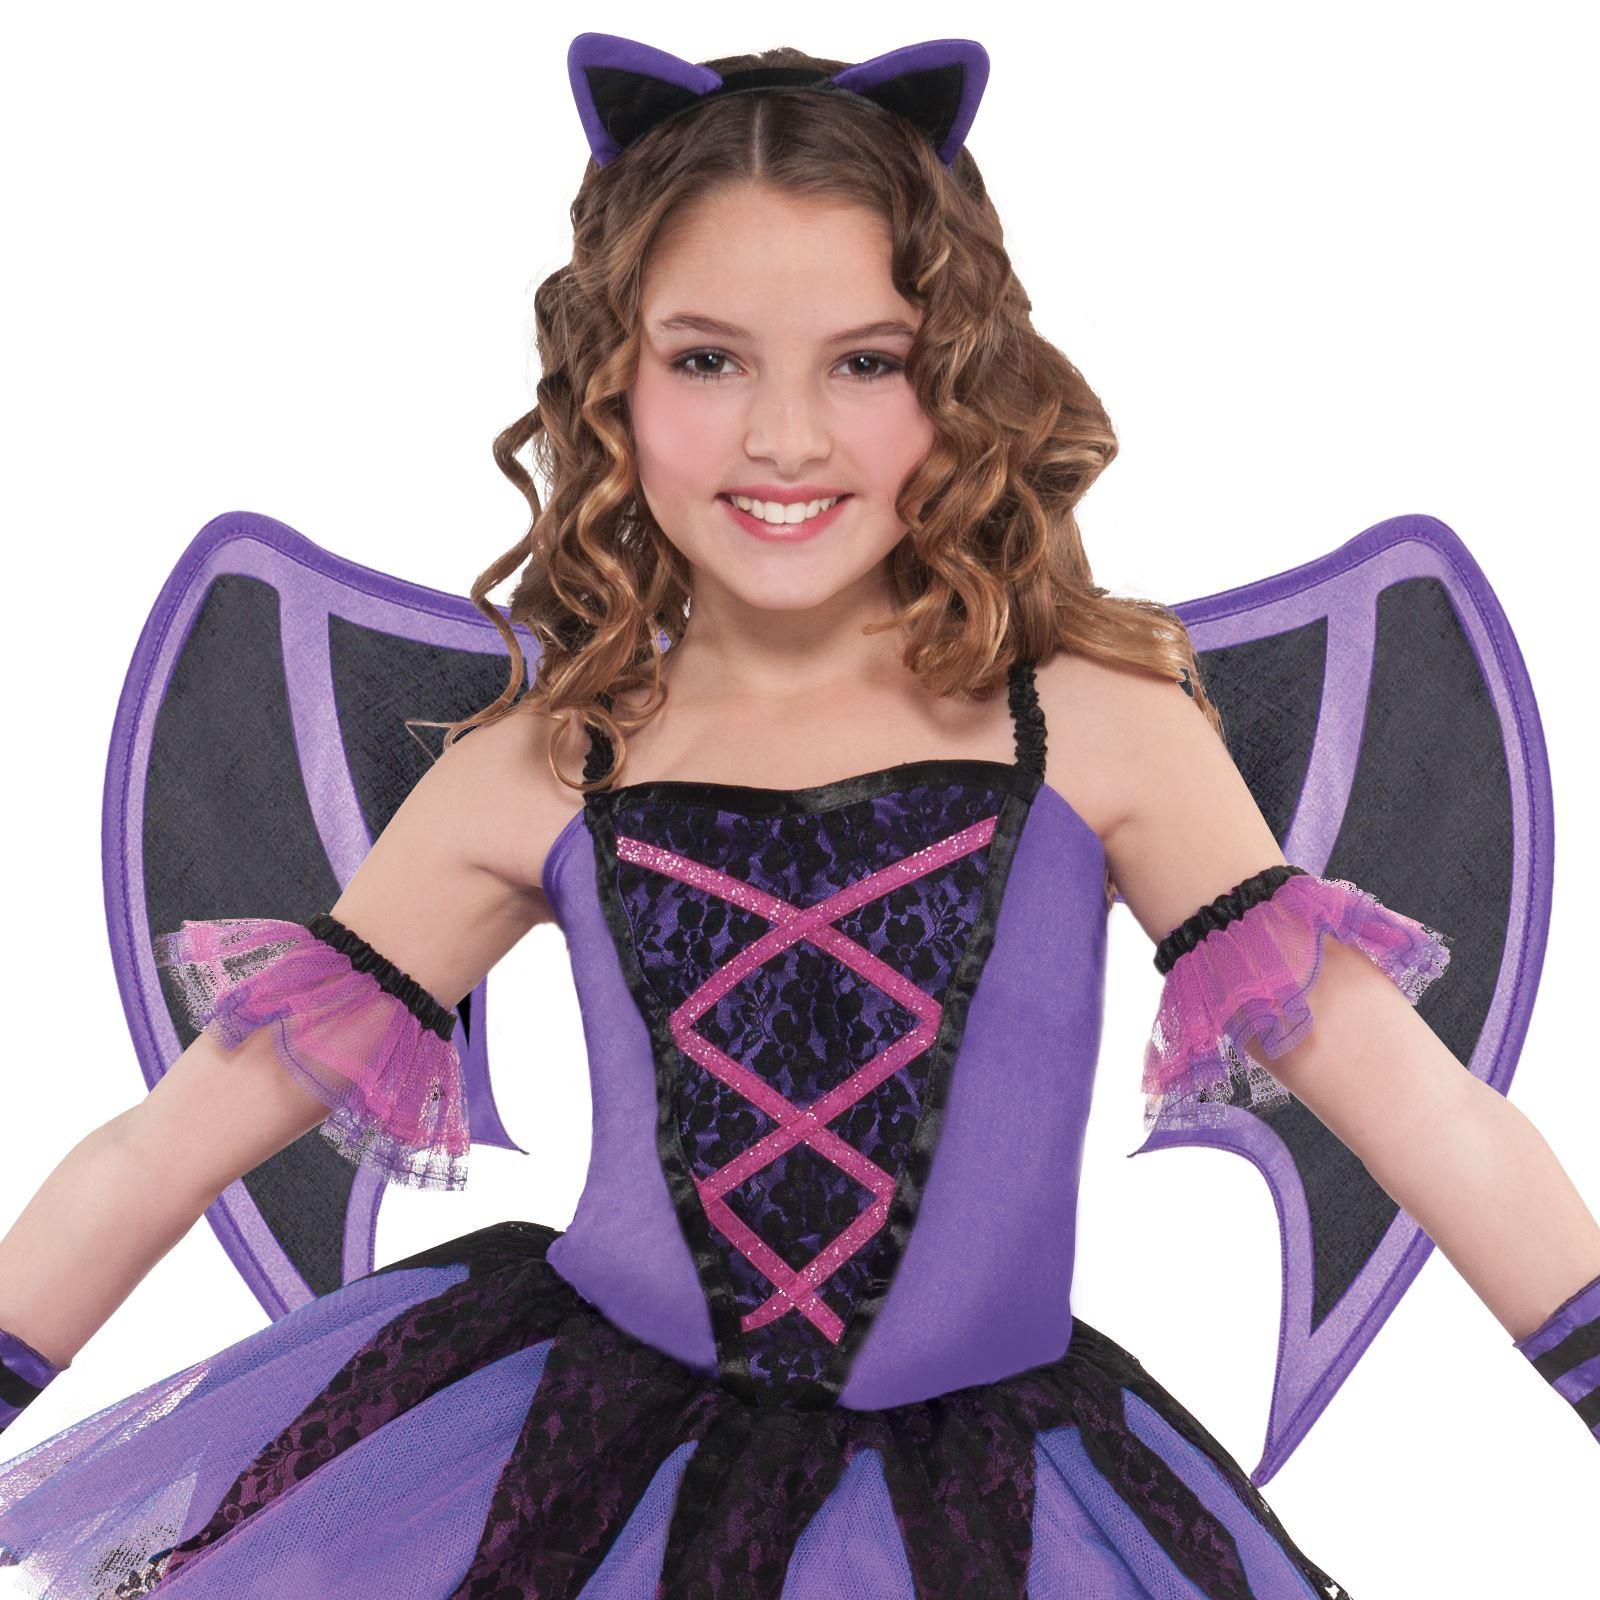 d07fa7304 Girls Ballerina Bat Costume Halloween Fancy Dress Party Kids ...